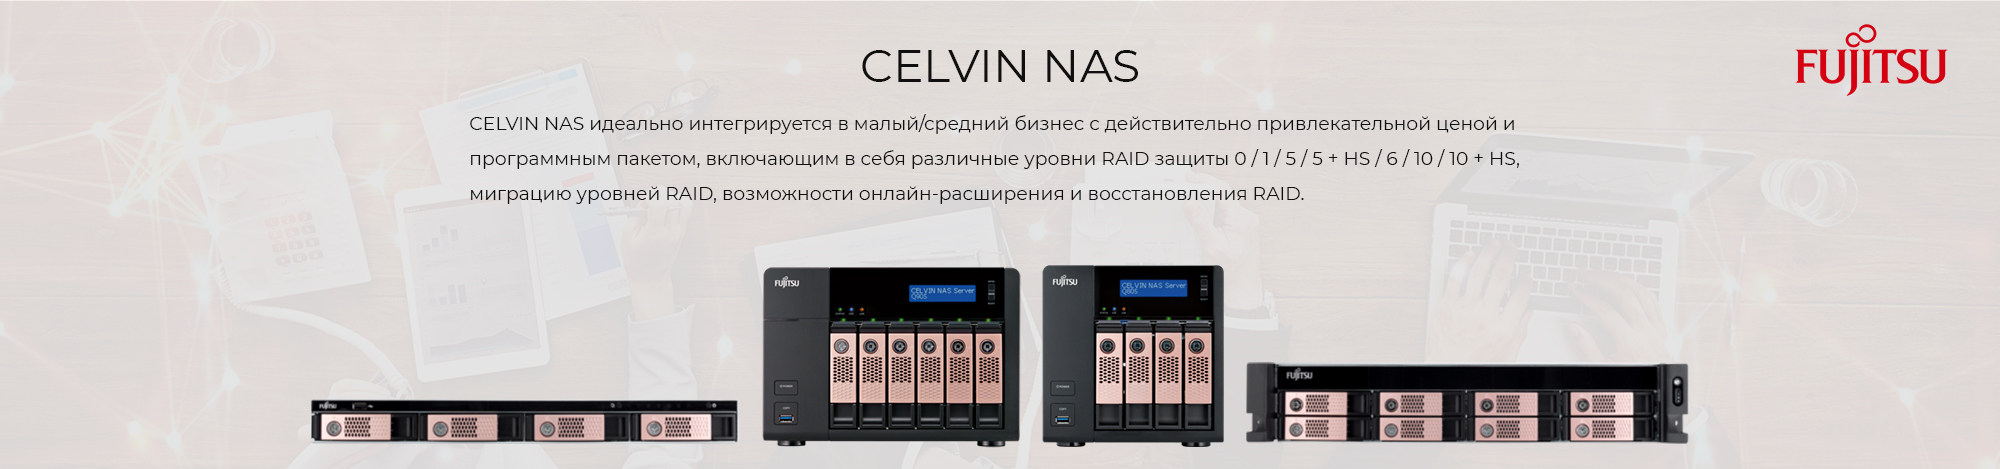 CELVIN-NAS-Сетевое-хранилище-от-Fujitsu